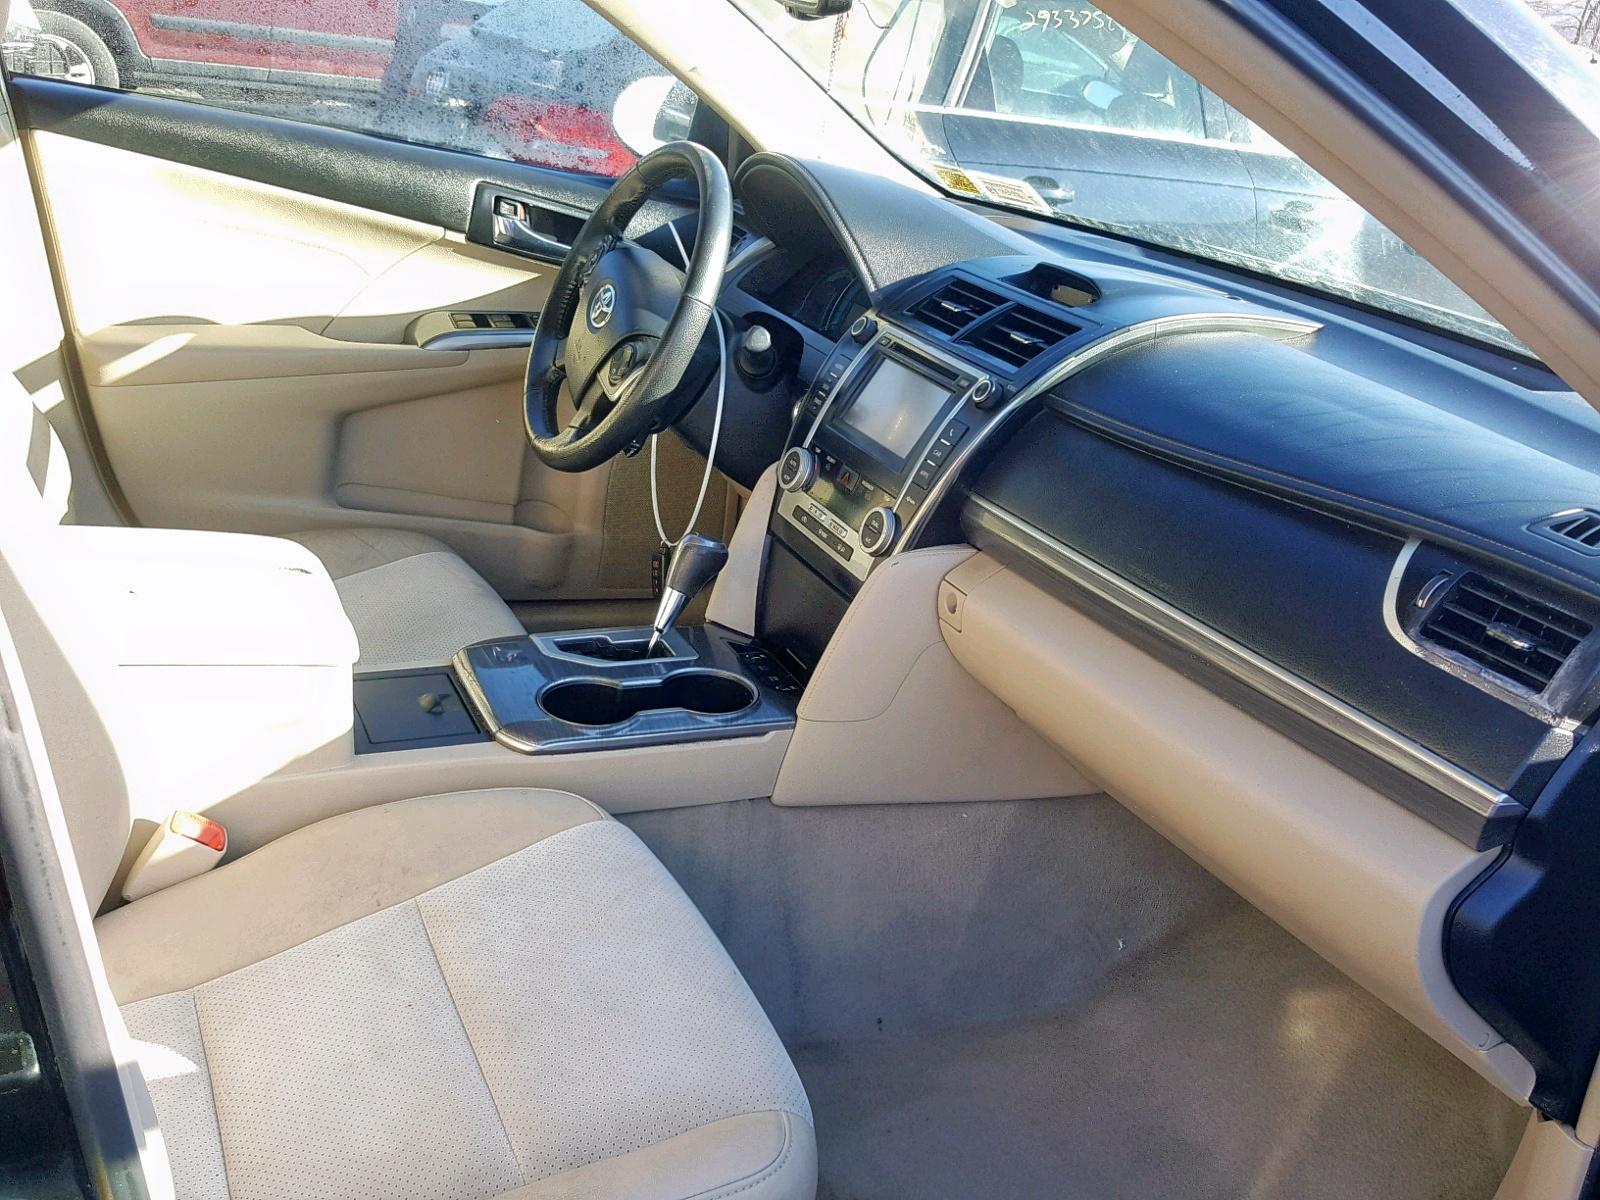 2014 Toyota Camry Hybr 2.5L close up View